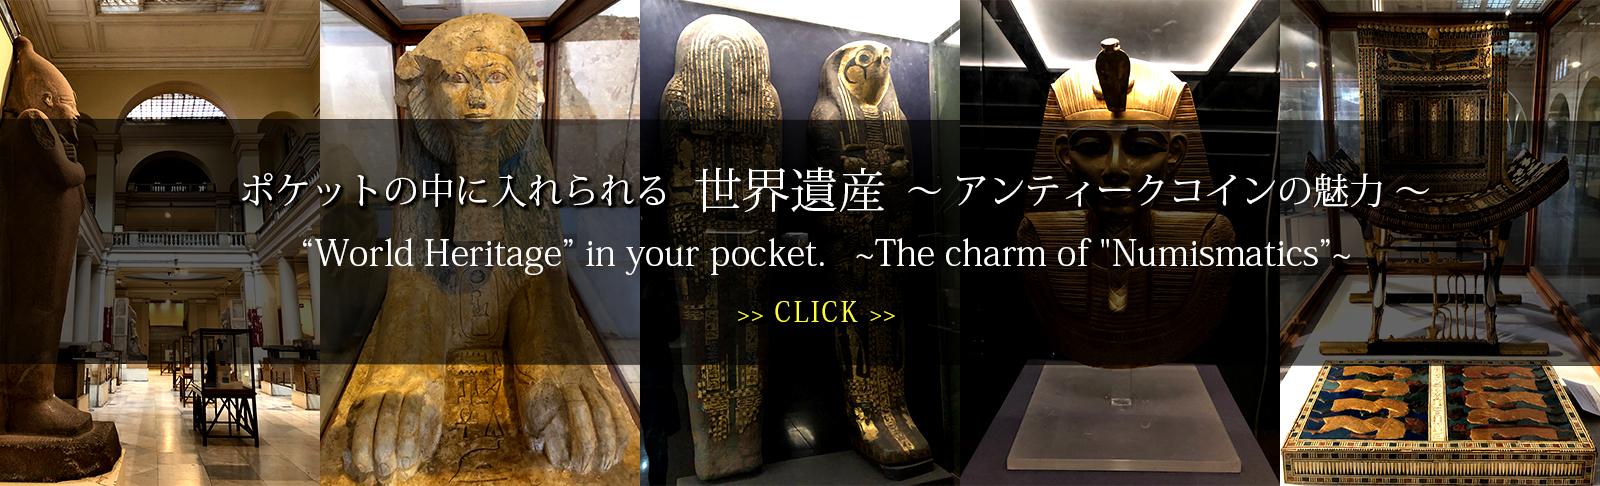 banner_pc_charm_002